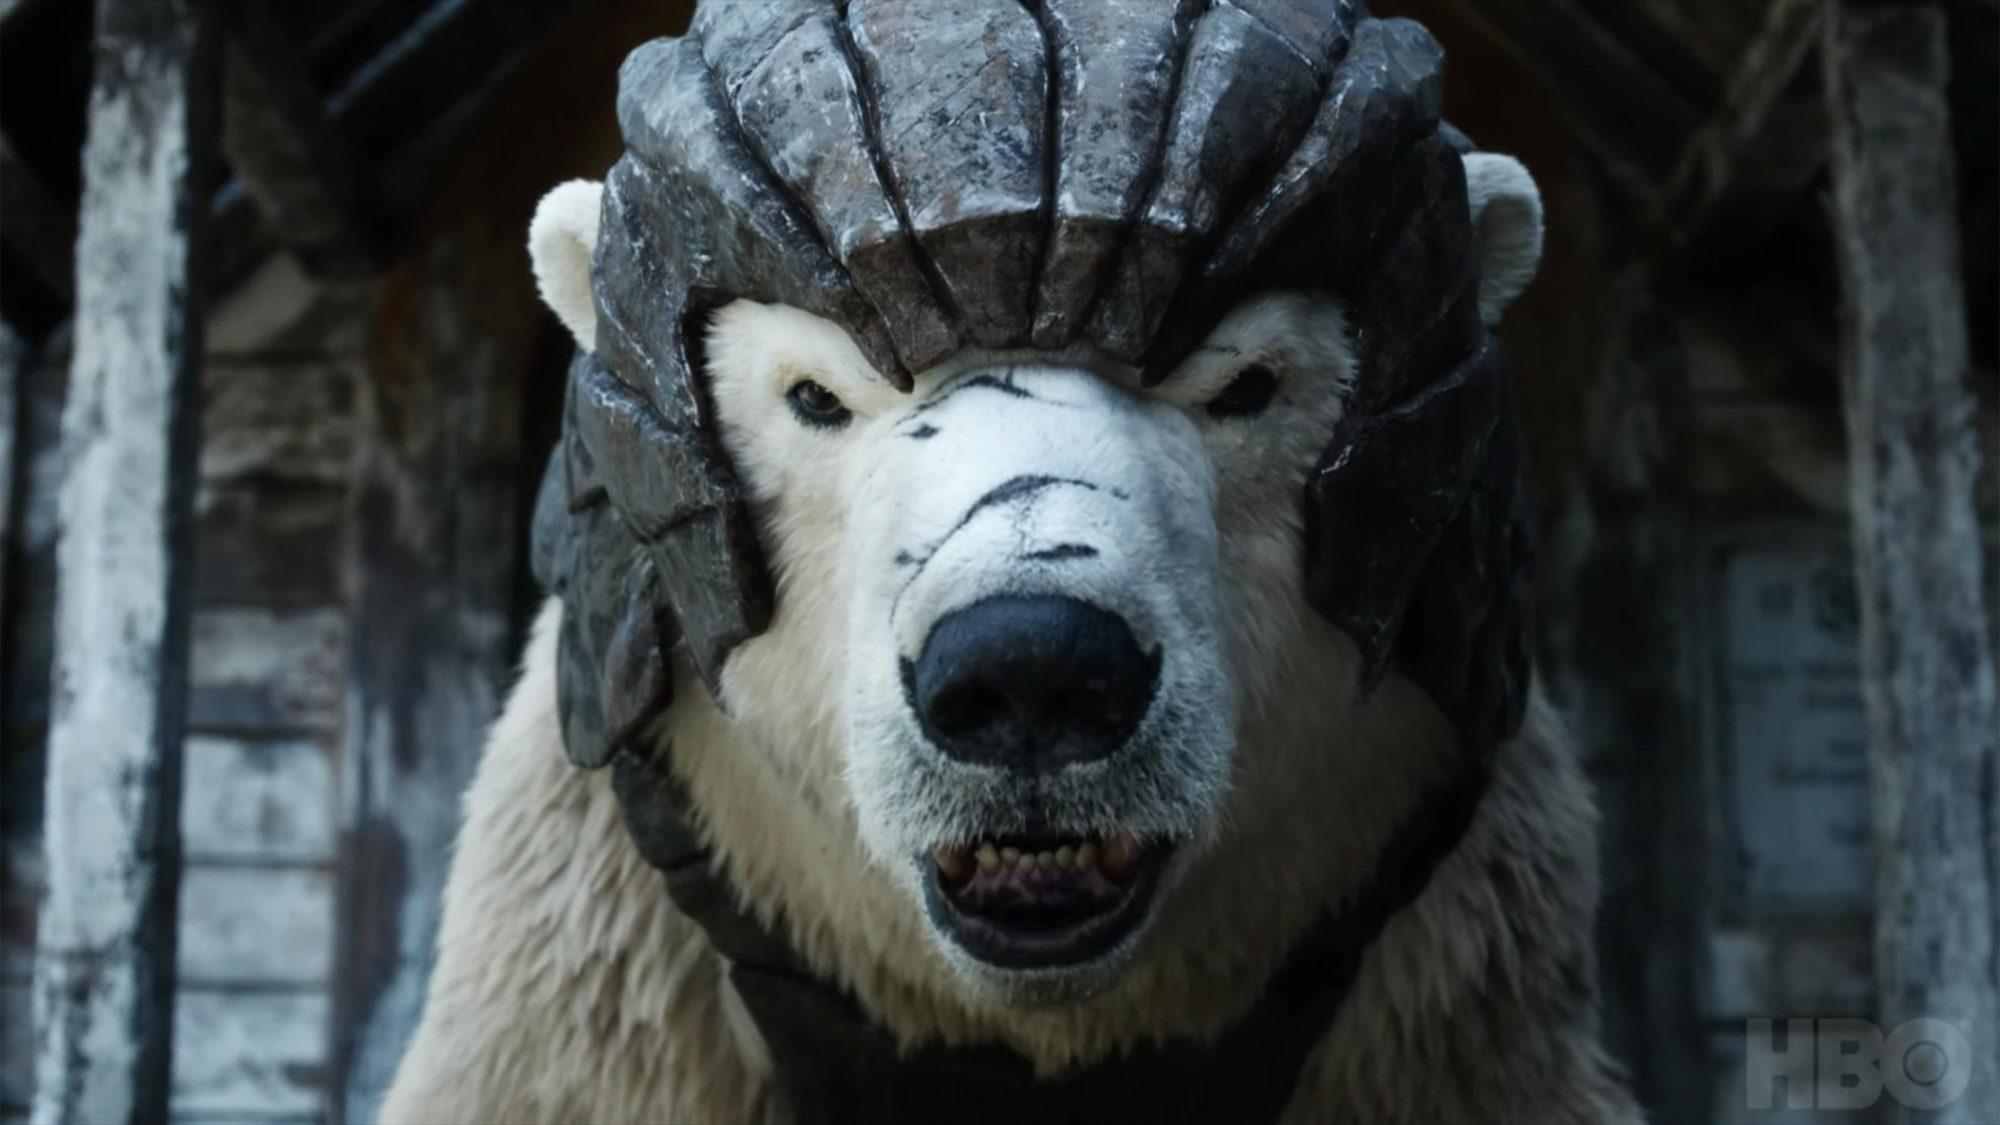 His Dark Materials: Season 1 | San Diego Comic Con Trailer | HBO (screen grab) https://www.youtube.com/watch?v=1yuIE1OYnVI CR: HBO